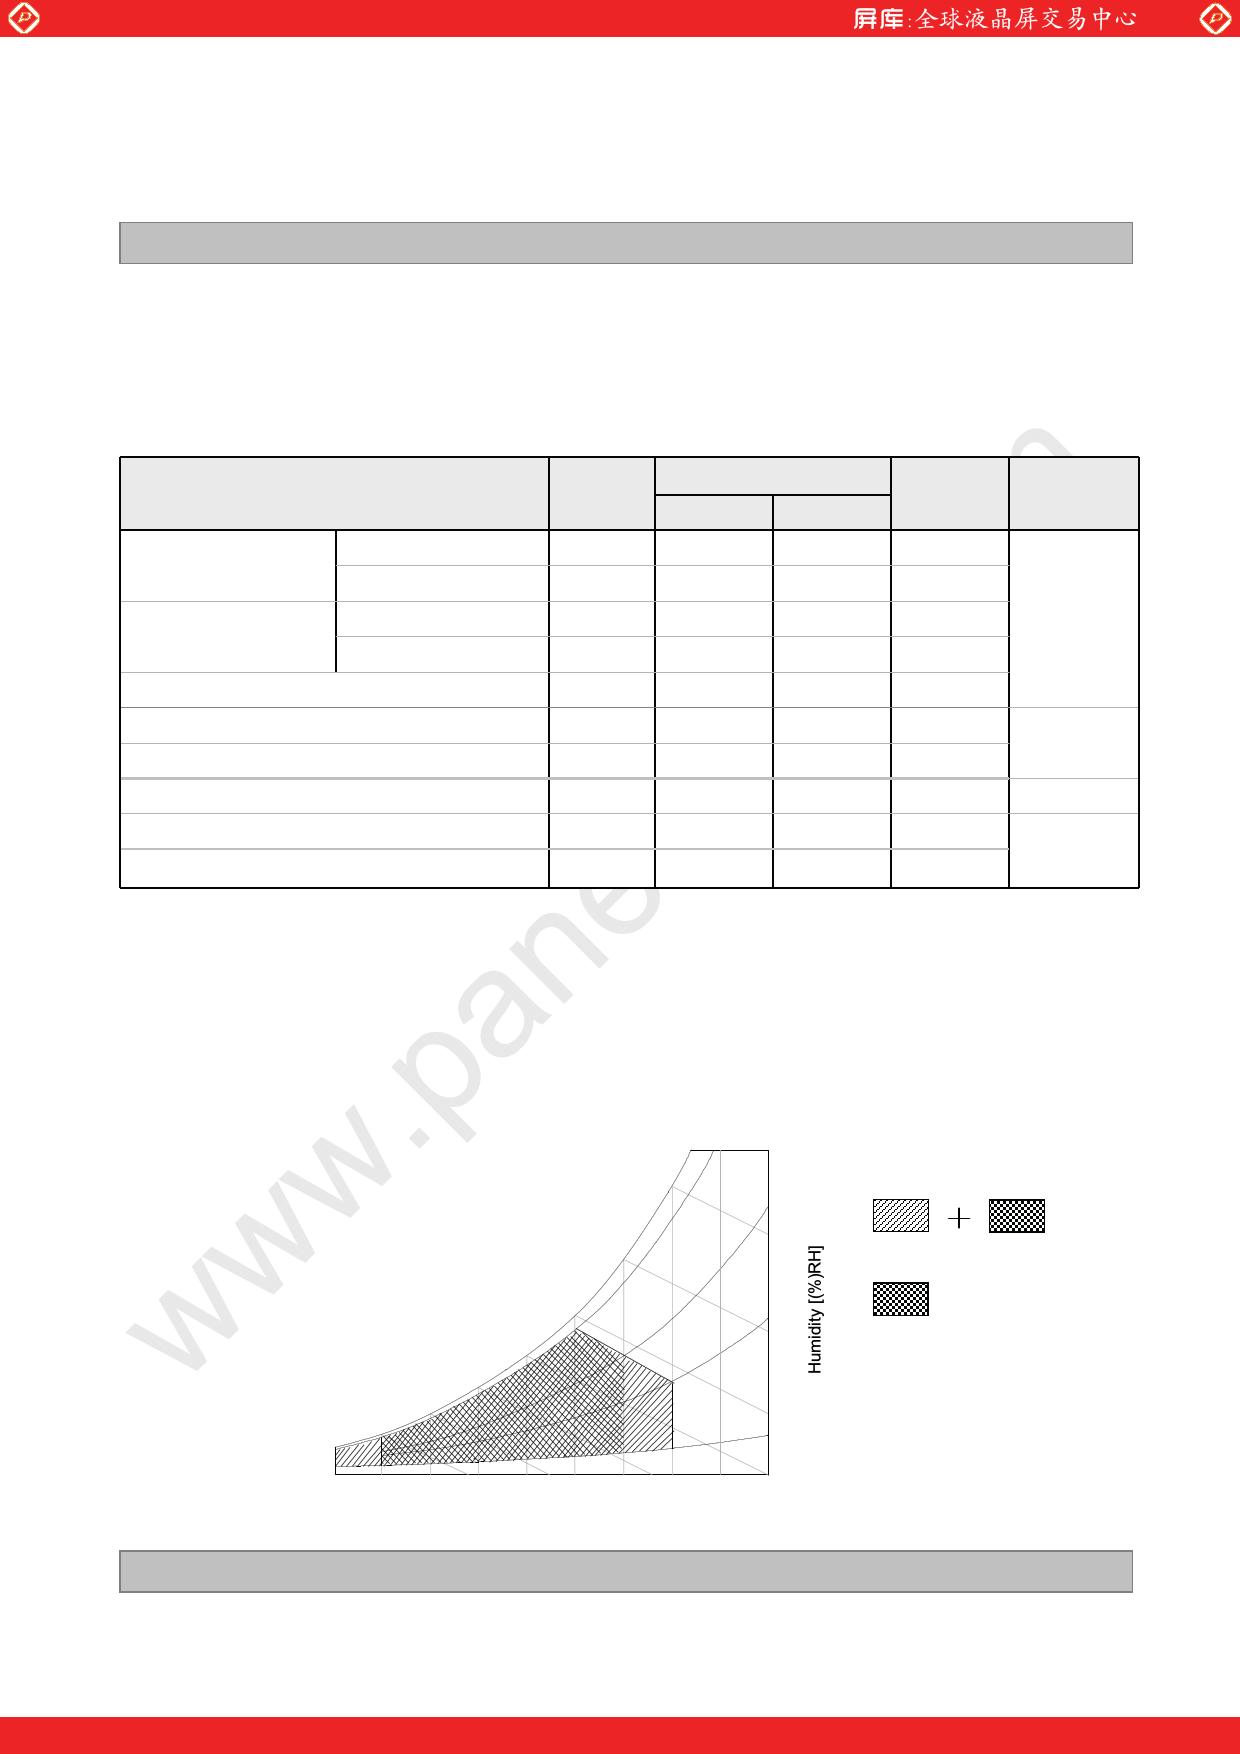 LC320DUE-SFR1 pdf